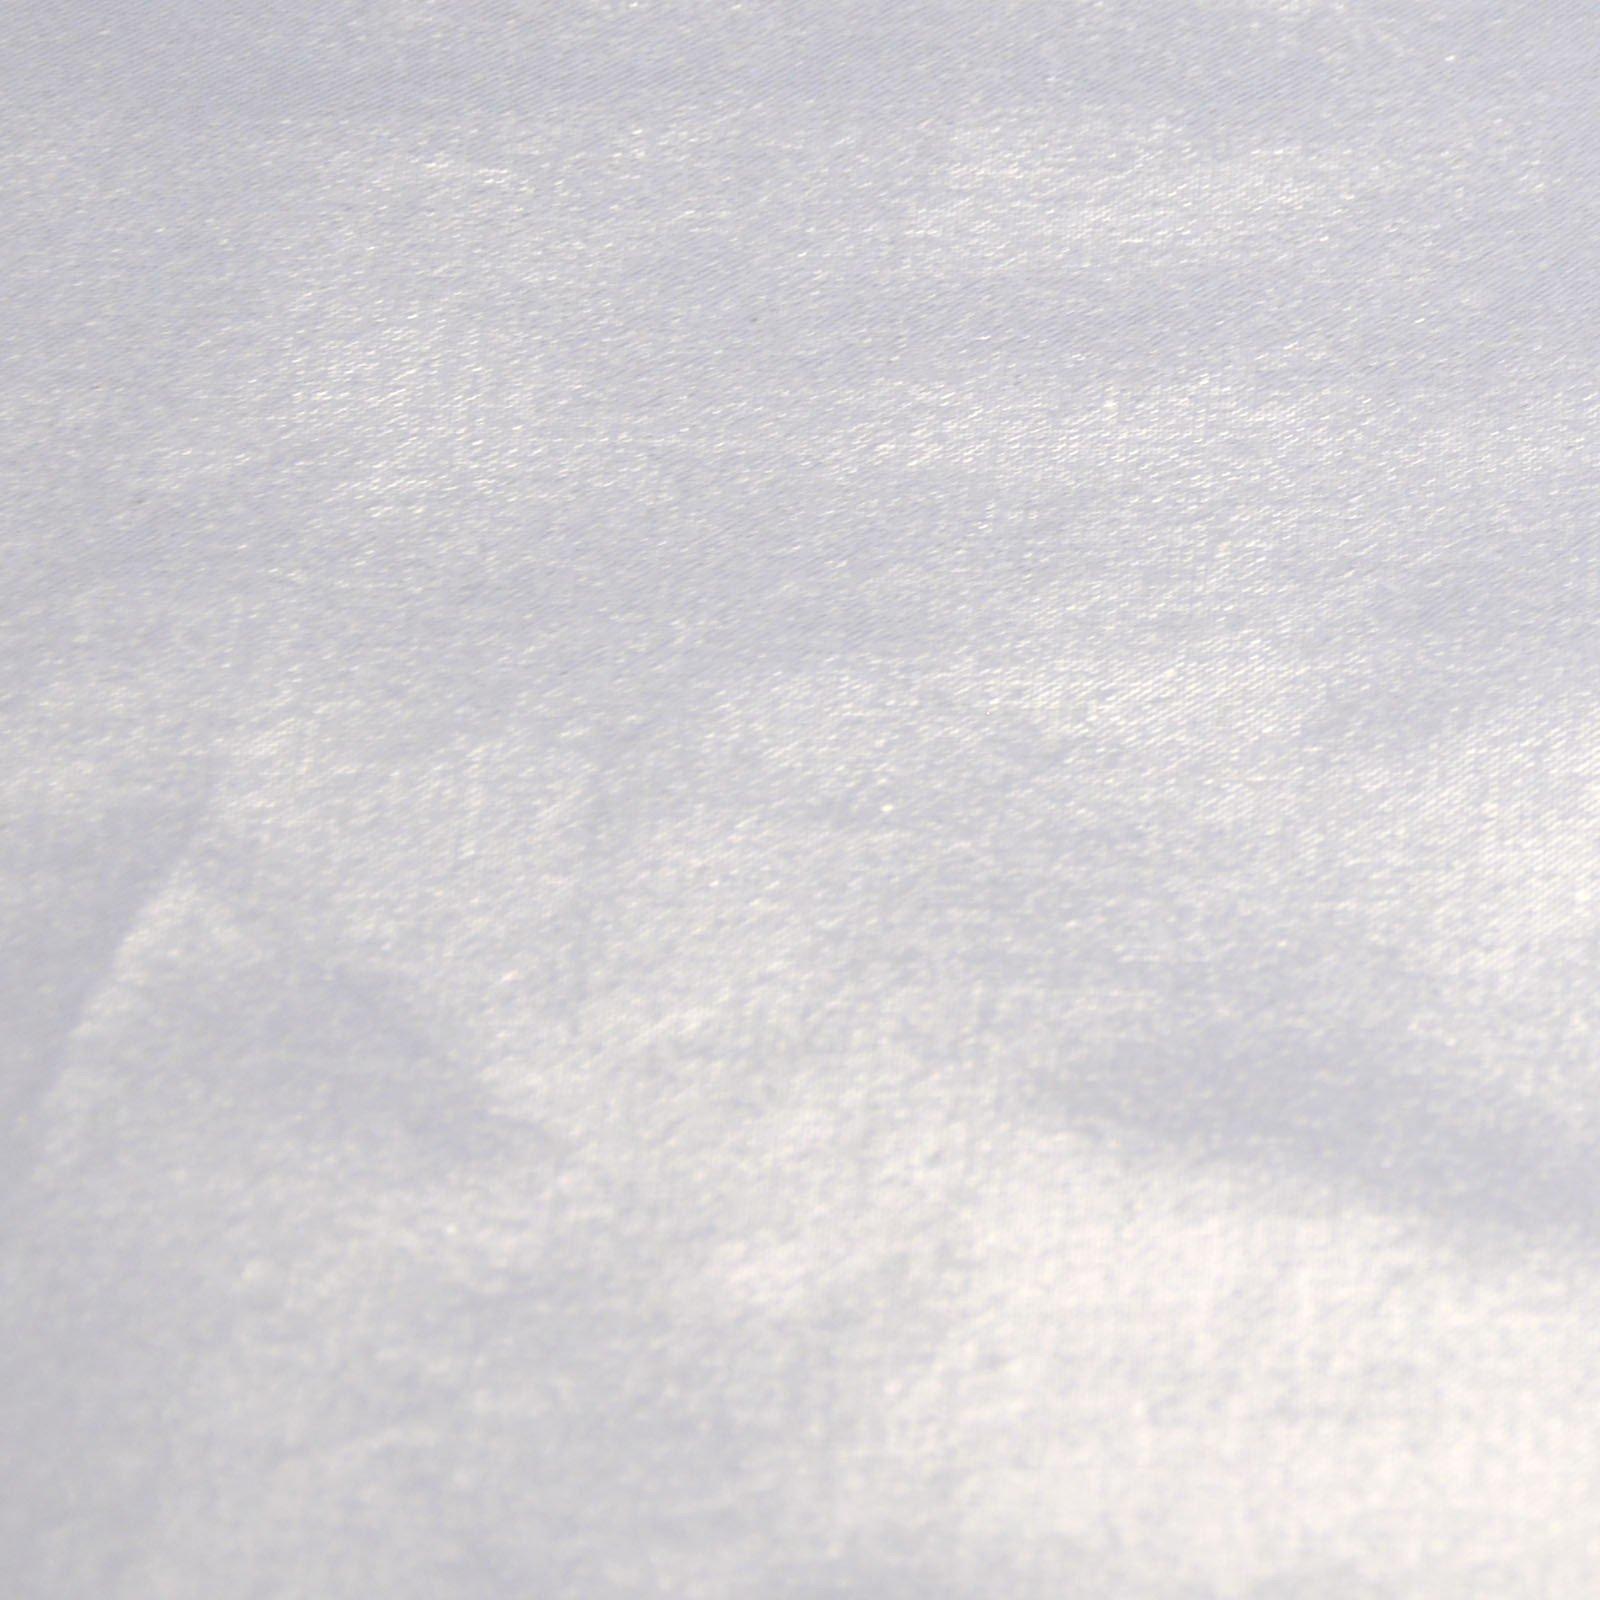 Glitz - Silver / White FQ<br/>Maywood Studio GLI-SIW